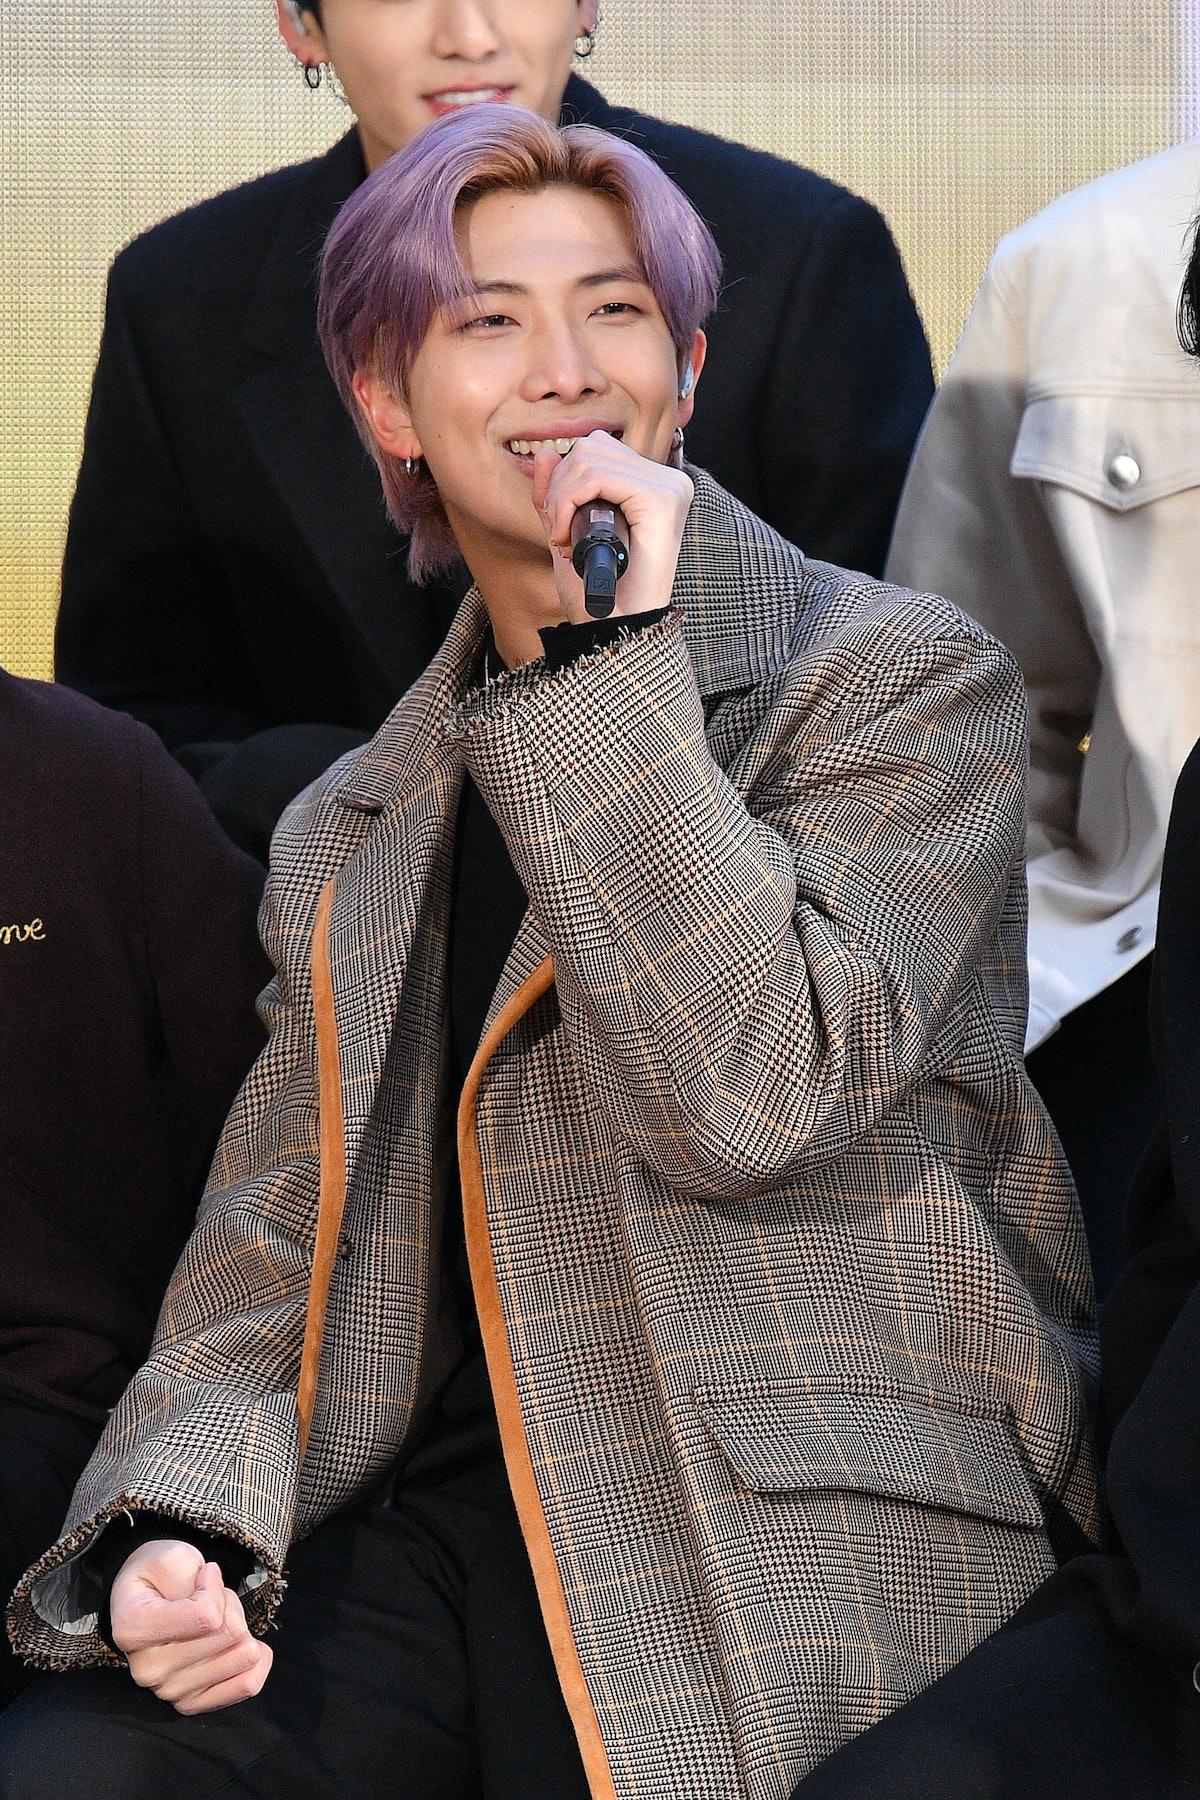 RM attends a live interview.